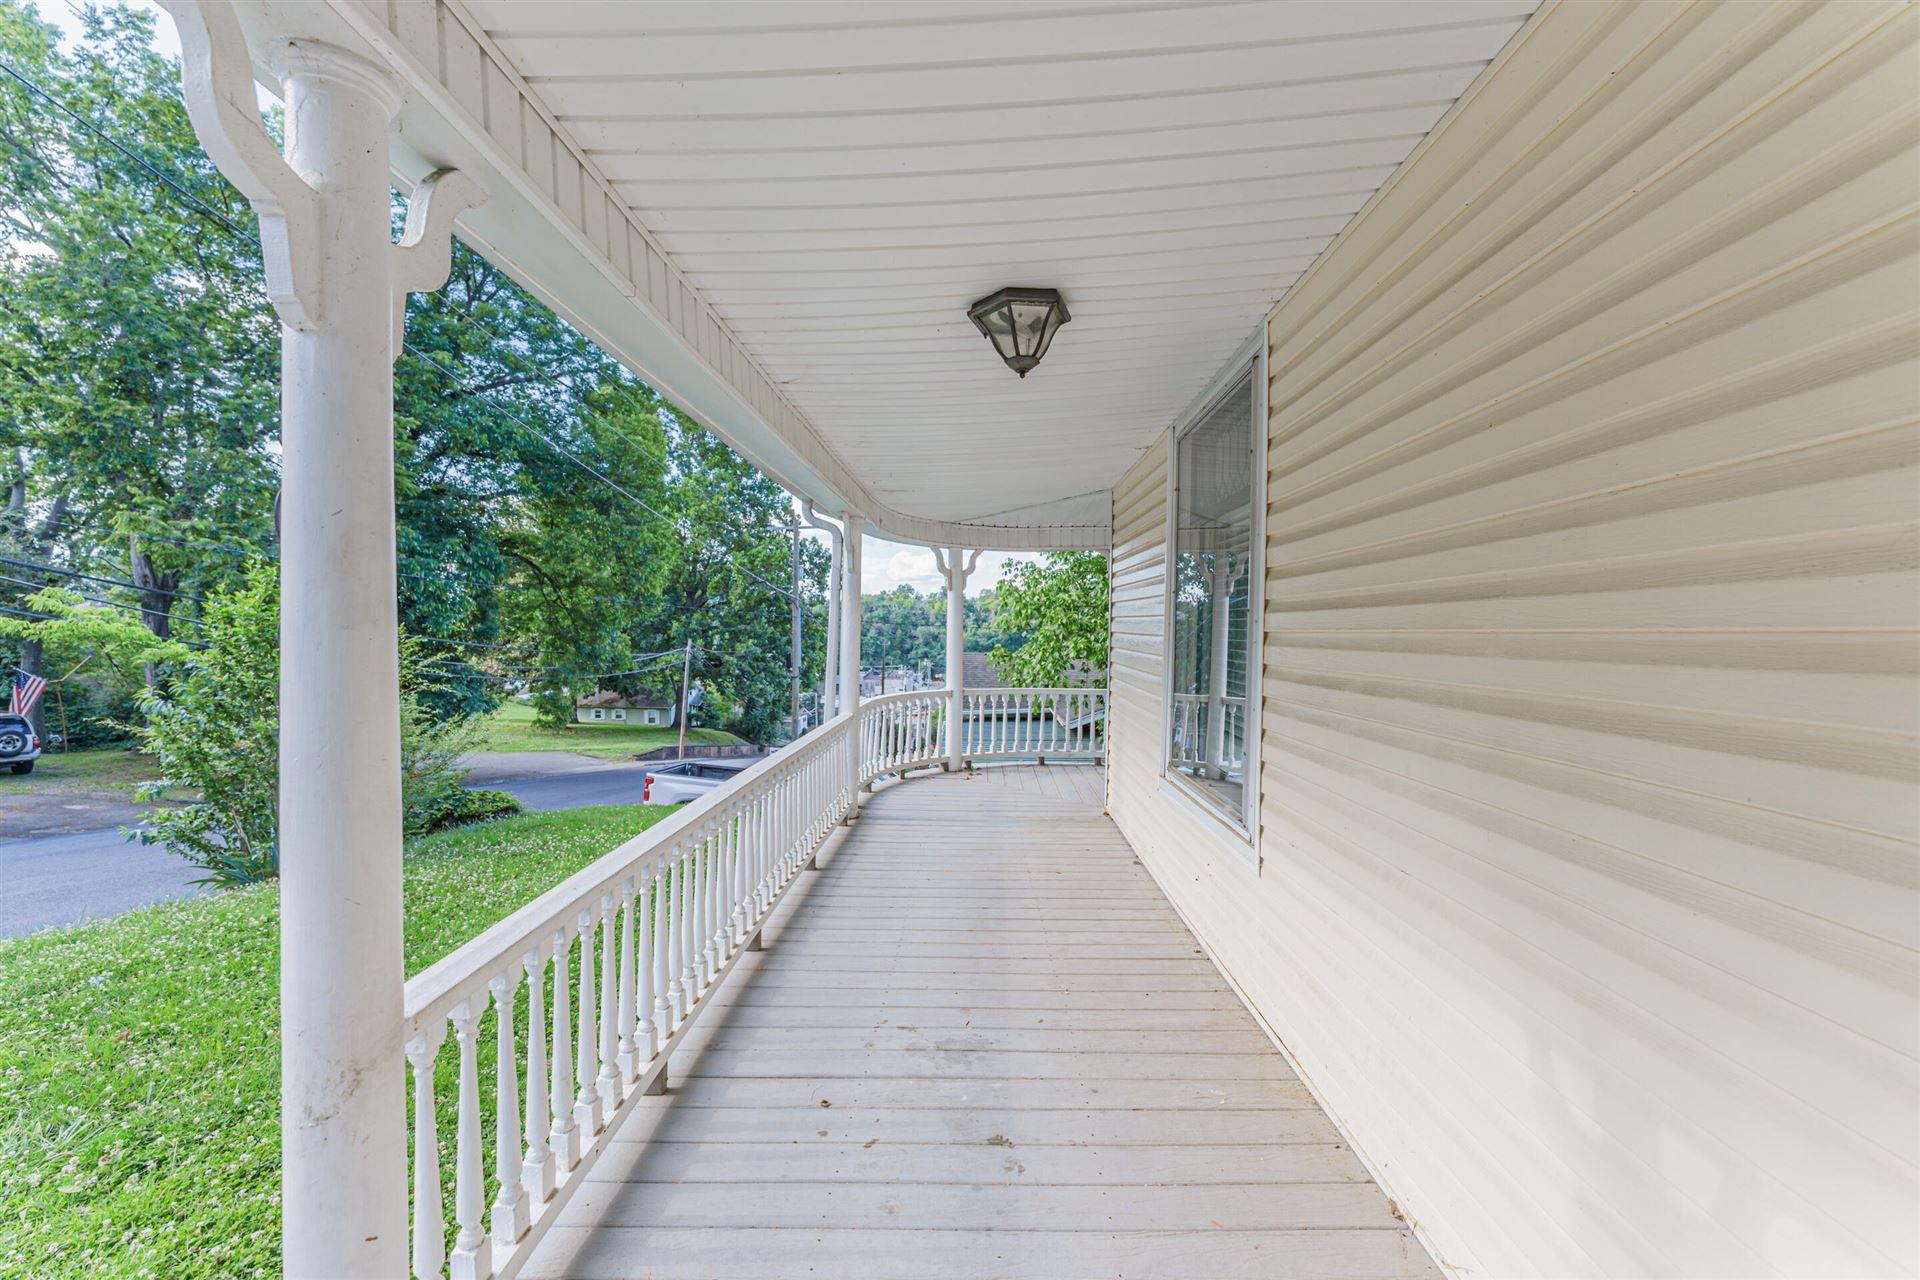 Photo of 208 Mims Ave, Newport, TN 37821 (MLS # 1156881)